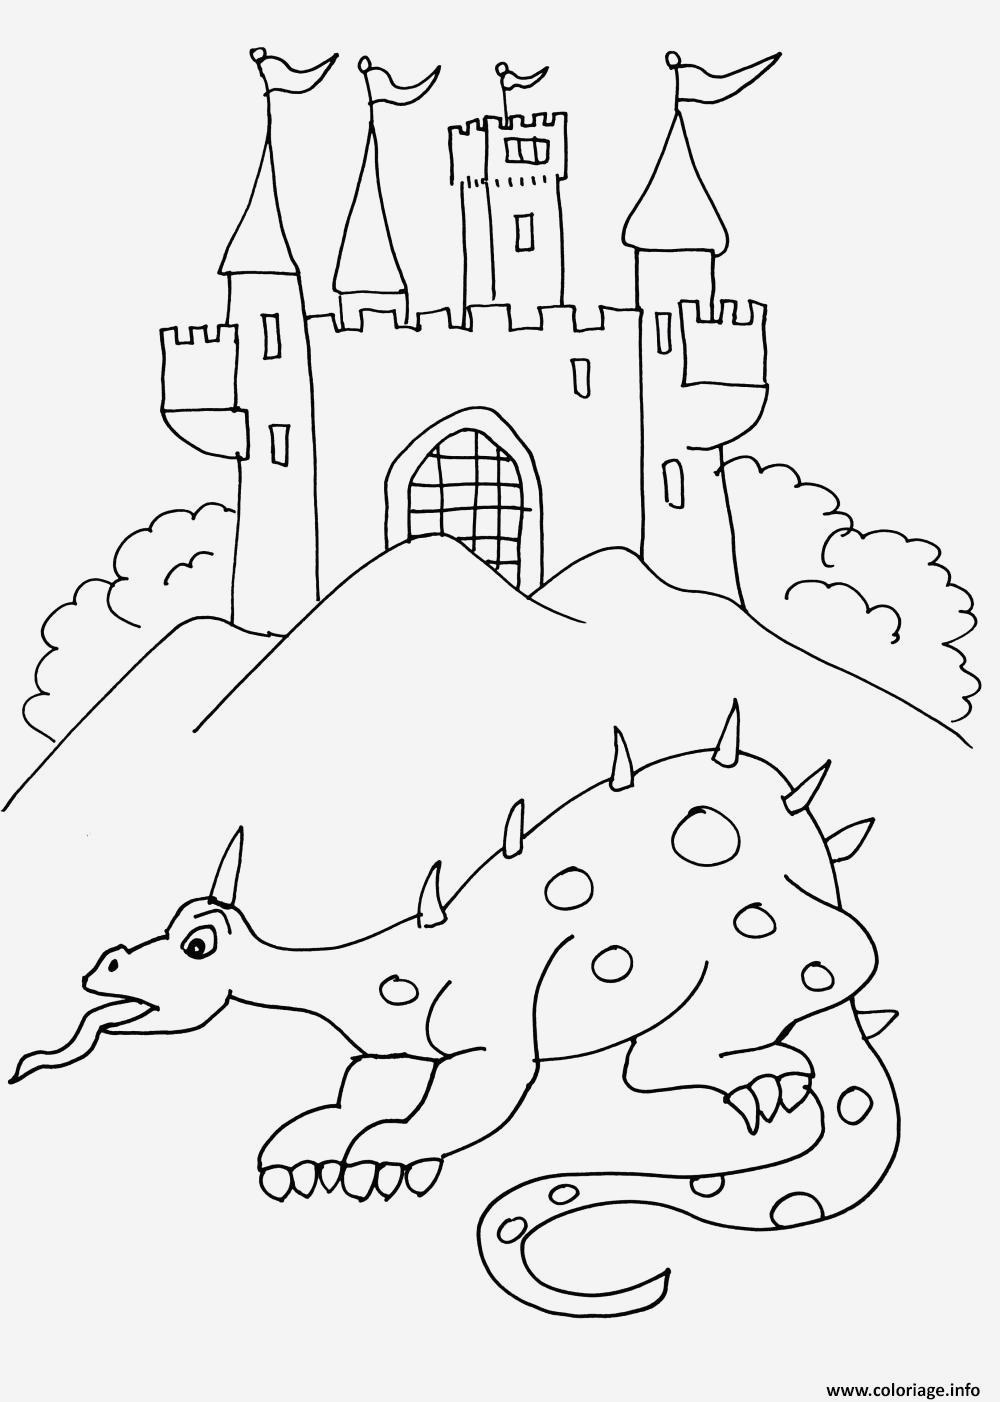 Coloriage Chateau De Princesse Gratuit Archives - Coloriages tout Coloriage À Imprimer Chateau De Princesse